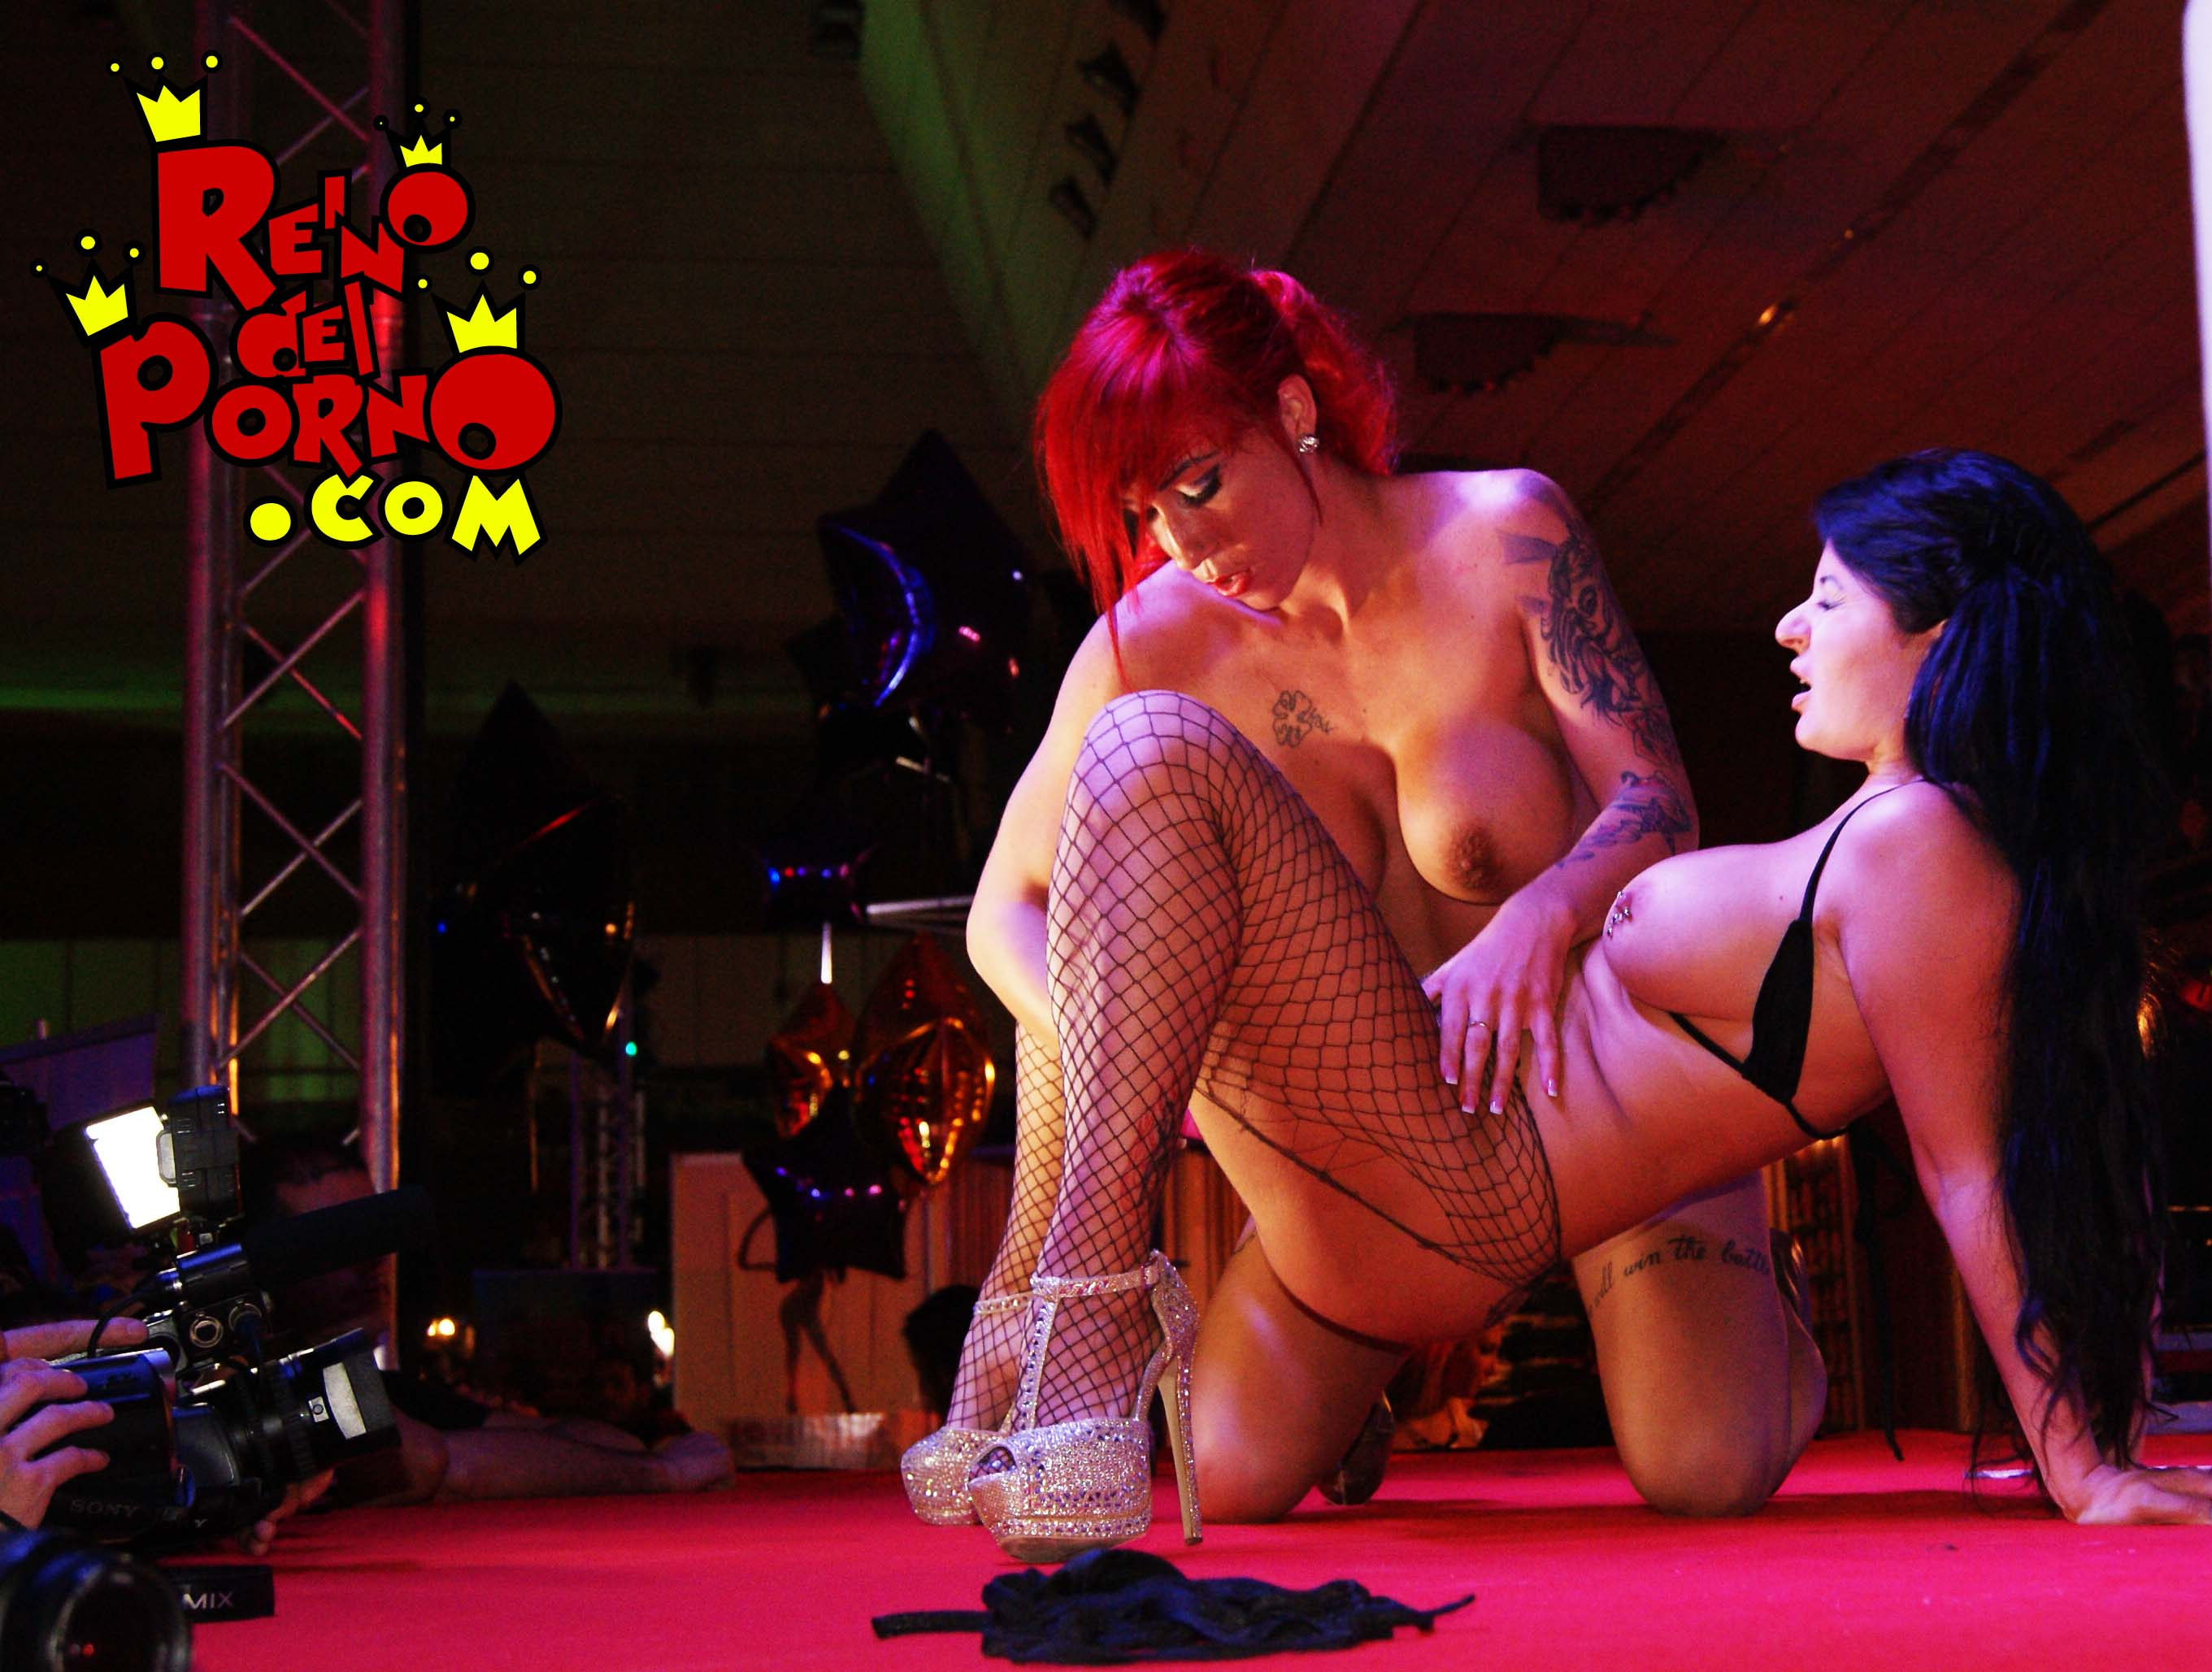 Lidya rouge show porno en sev 2013 - 1 part 6